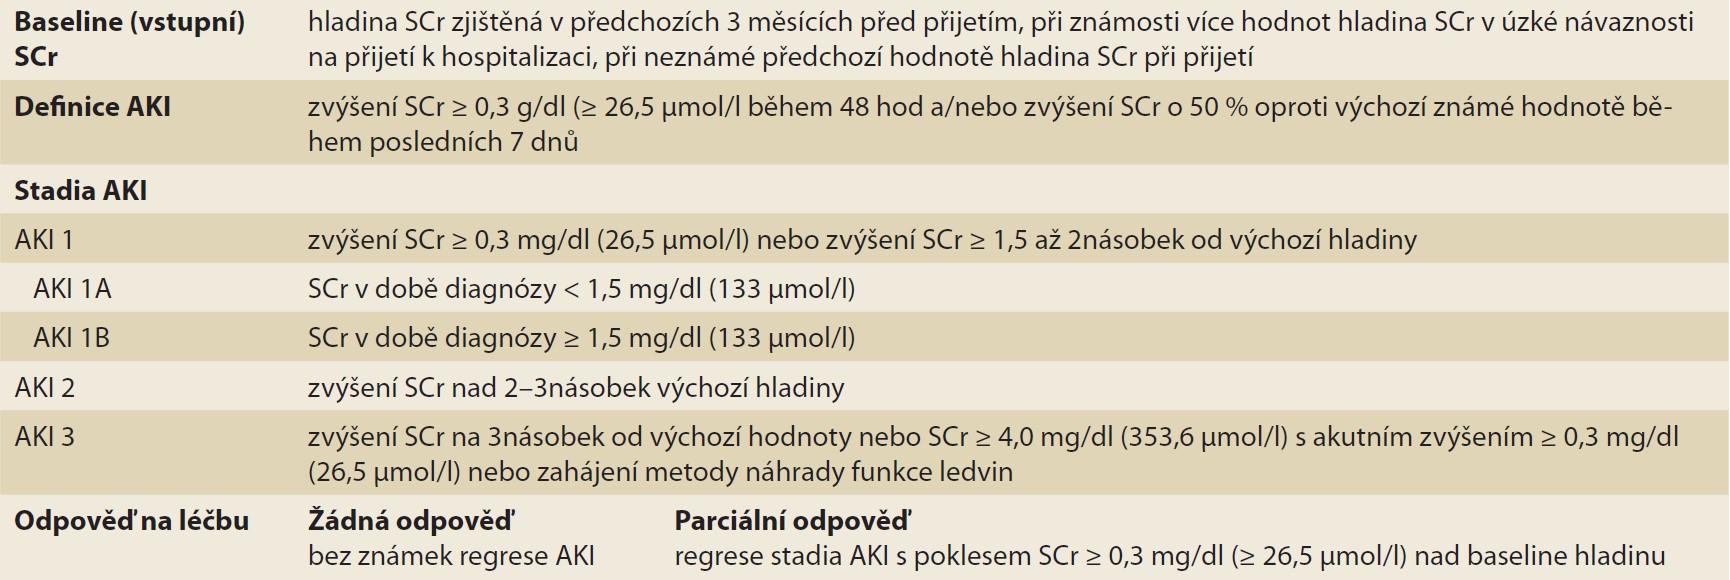 Tab. 1. Diagnostická kritéria AKI podle ICA-AKI kritérií [10].<br> Tab. 1. AKI diagnotic criteria according to ICA-AKI criteria [10].